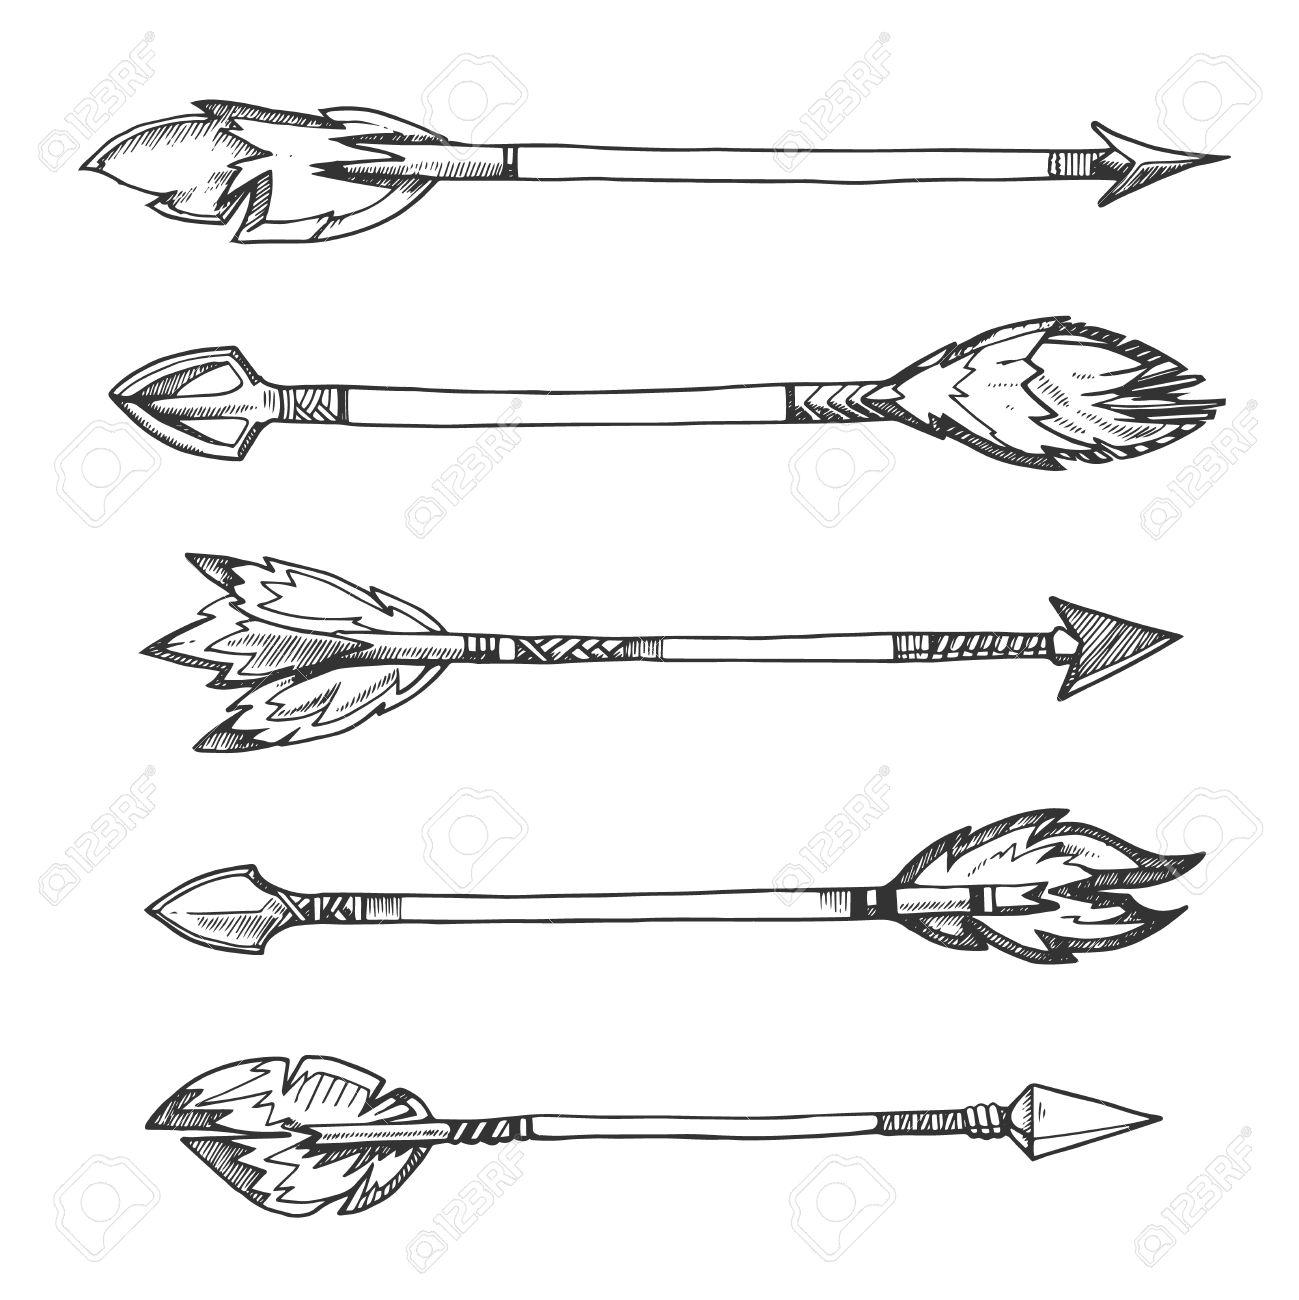 tribal indian arrows vector hand drawn decorative elements in rh 123rf com Simple Arrow Vector tribal arrow vector free download